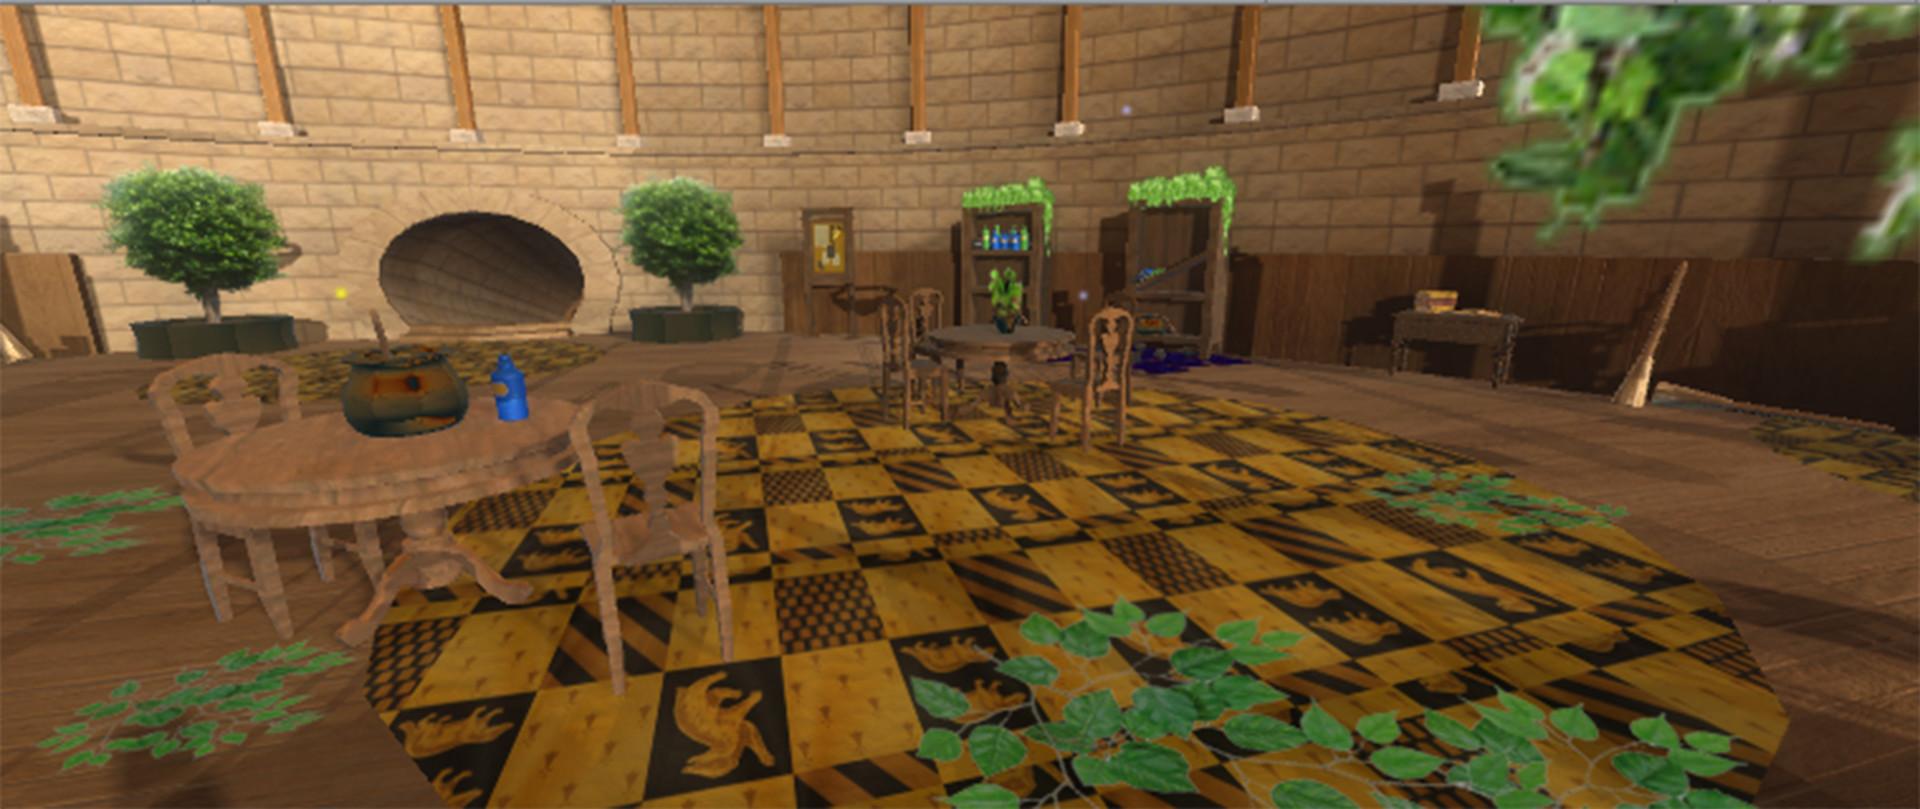 ArtStation - 3D Environment (Harry Potter - Hufflepuff Common Room ...